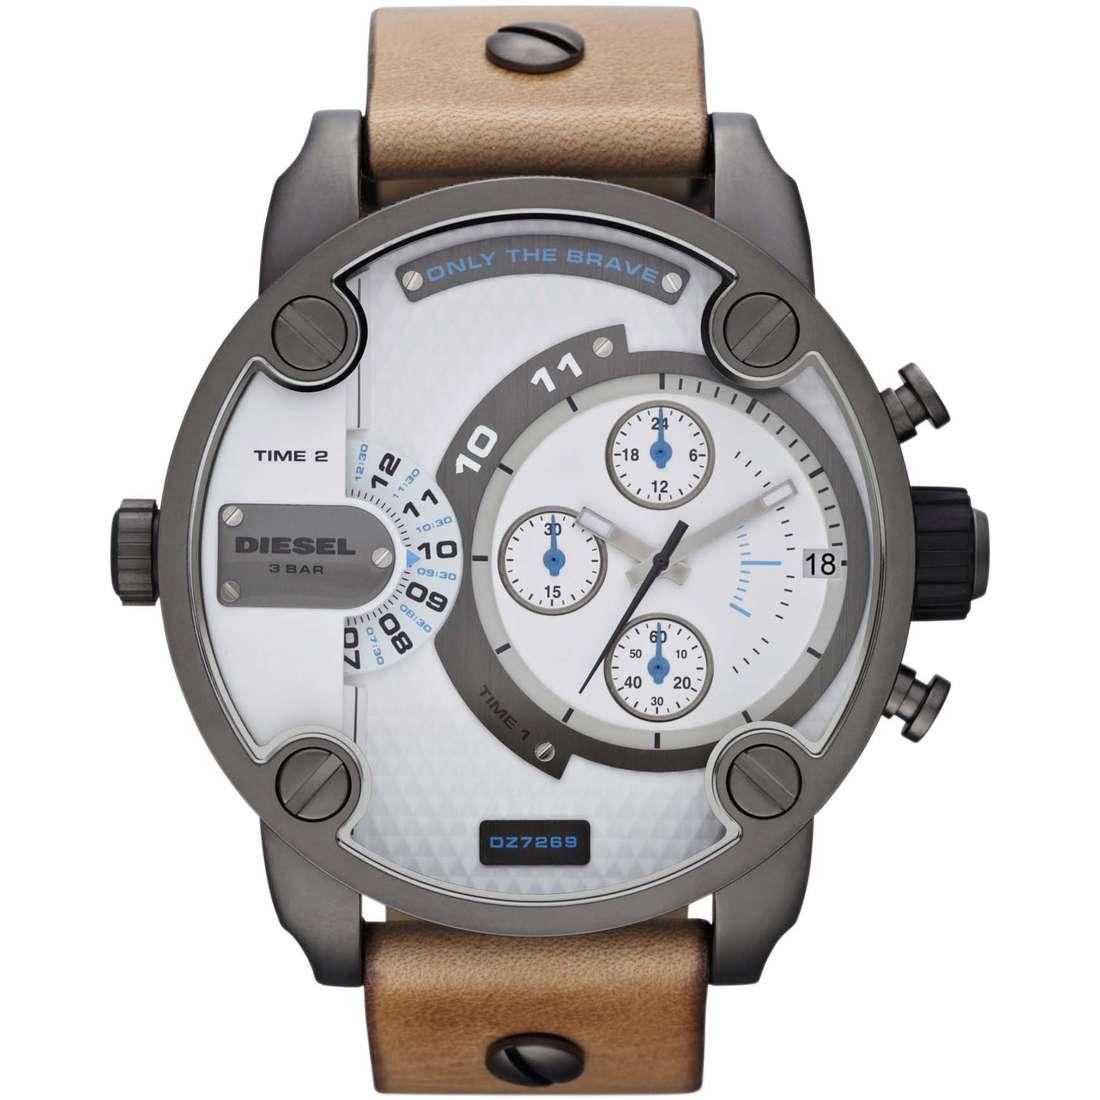 orologio multifunzione uomo Diesel DZ7269